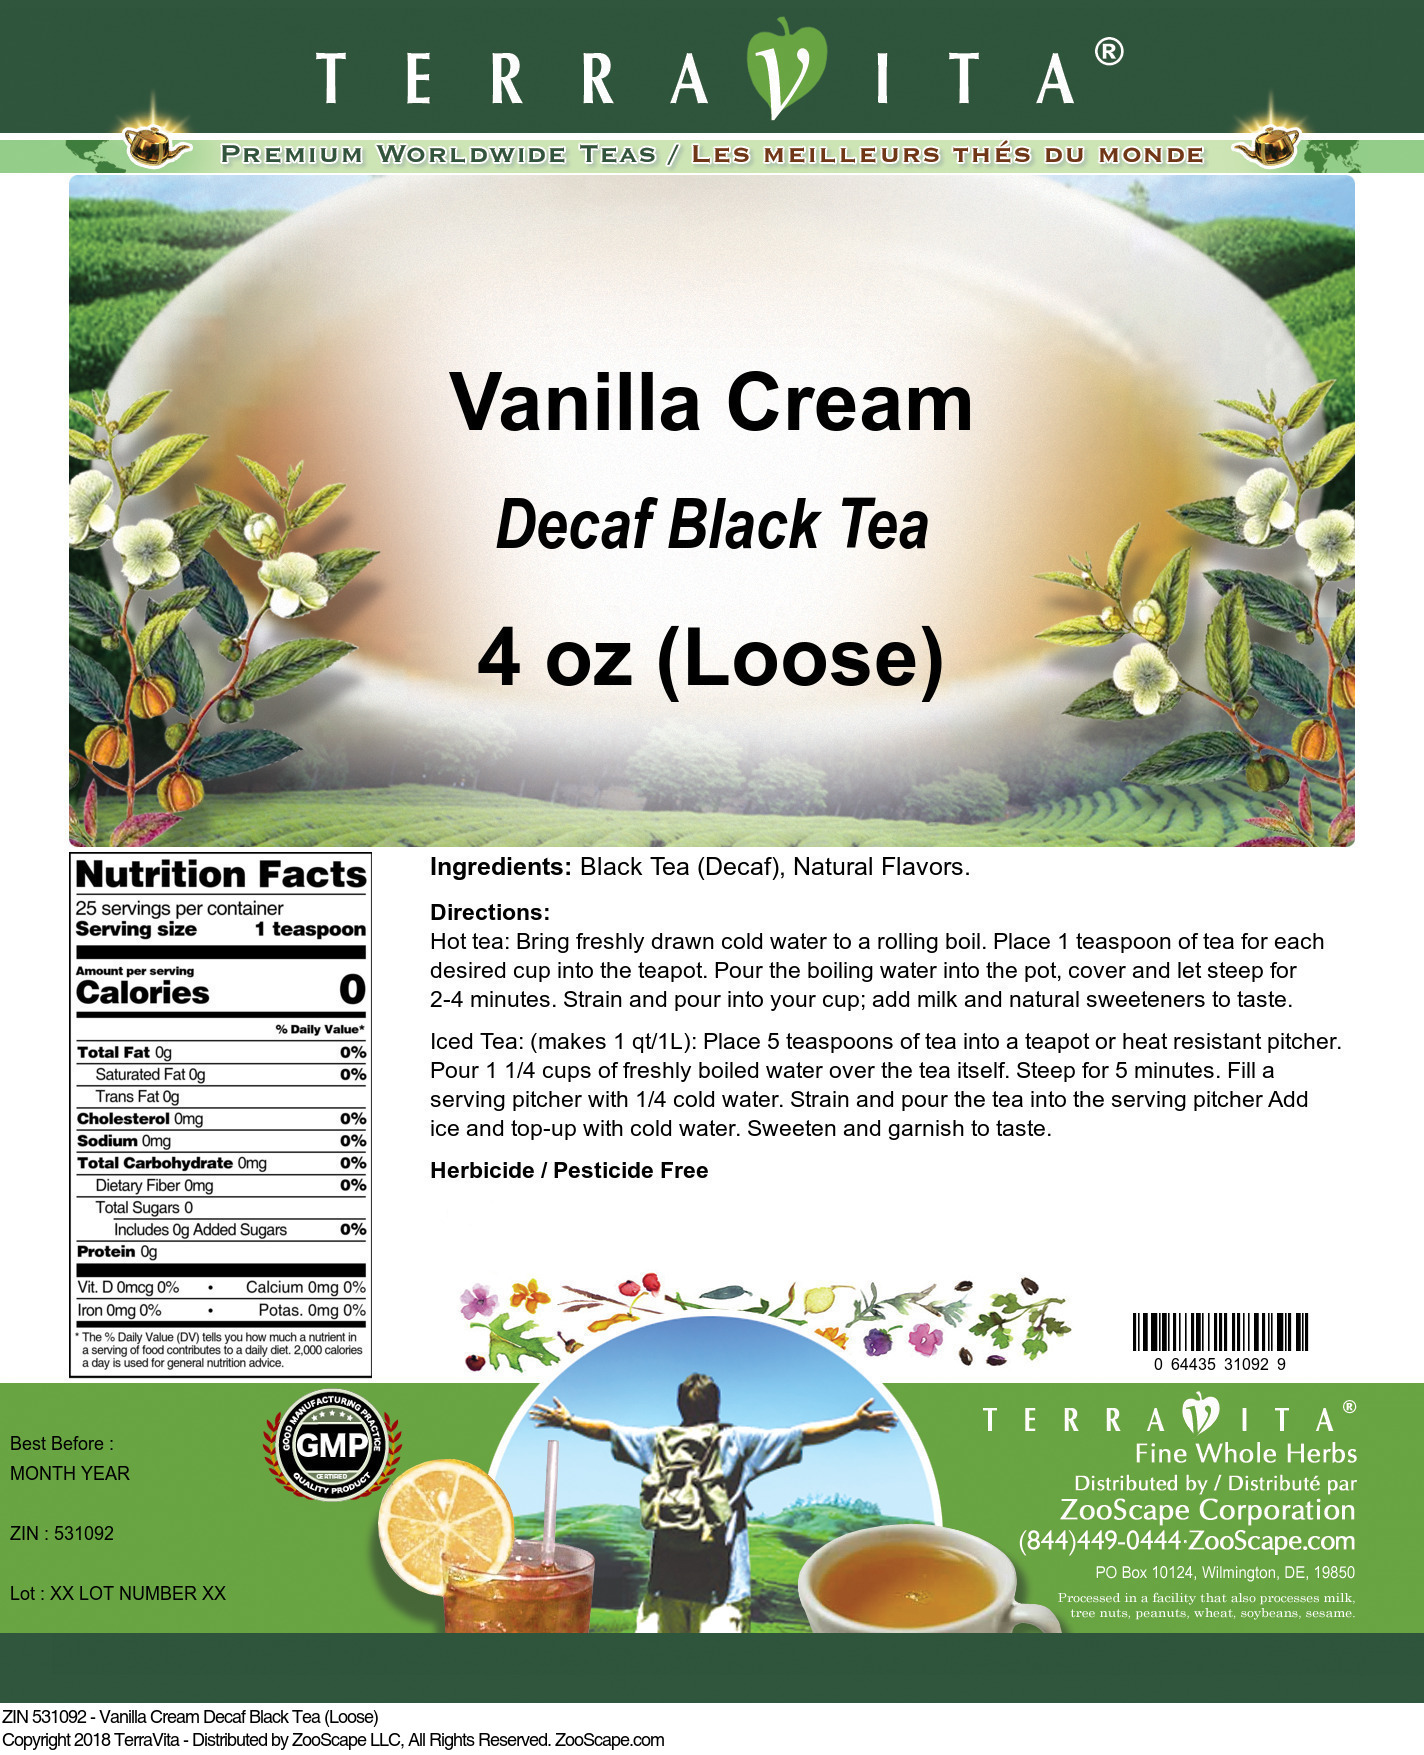 Vanilla Cream Decaf Black Tea